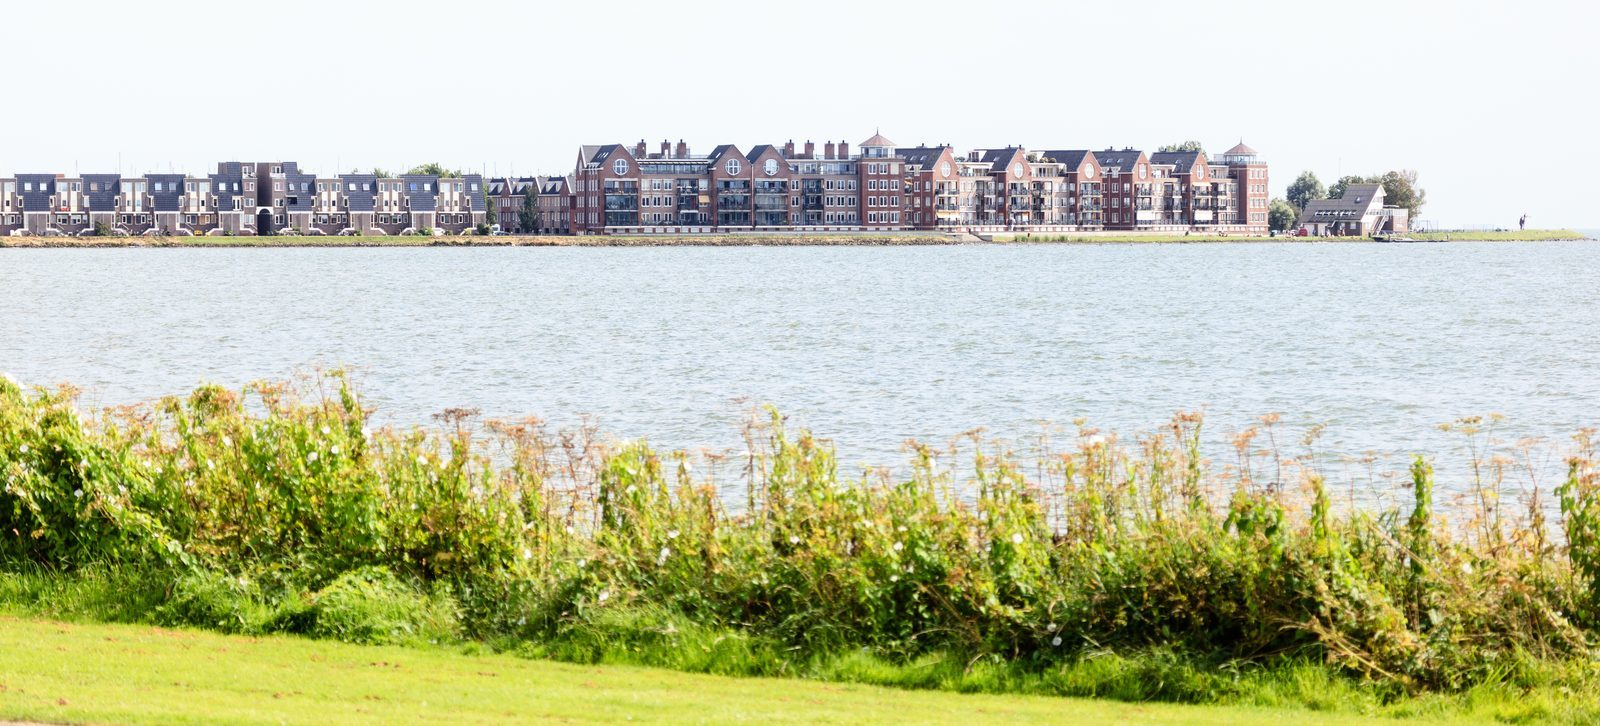 Ferienpark bei Hoorn